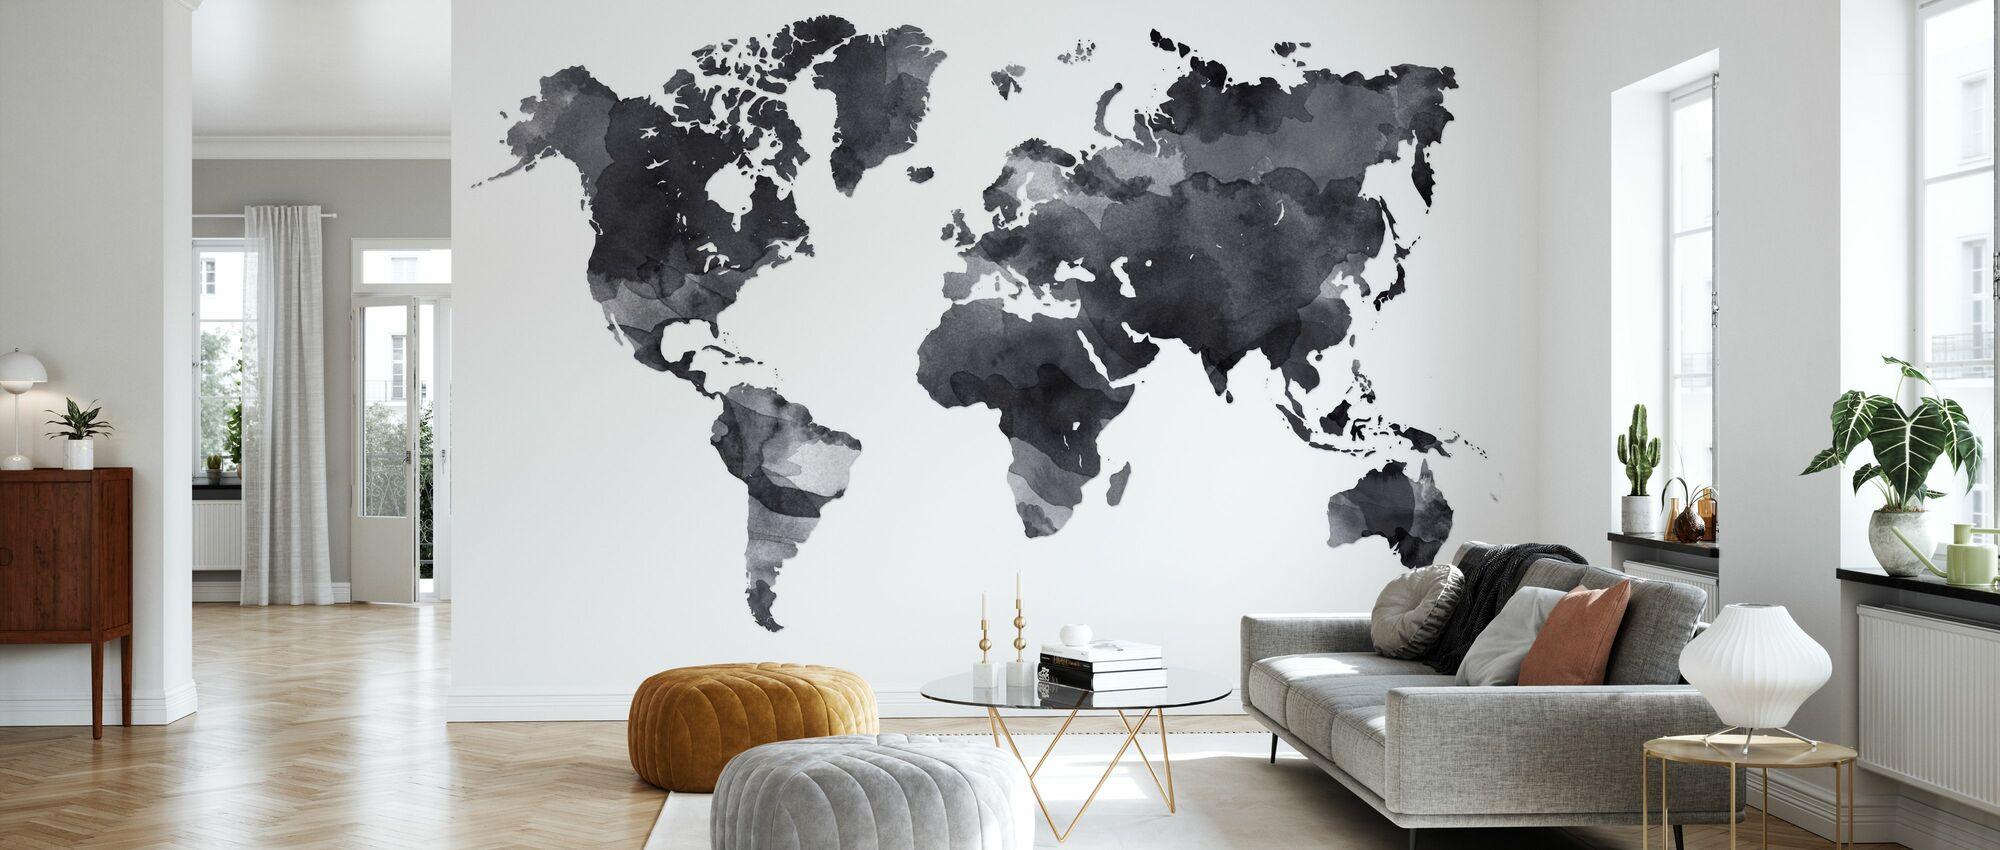 Black Ink Map - Wallpaper - Living Room